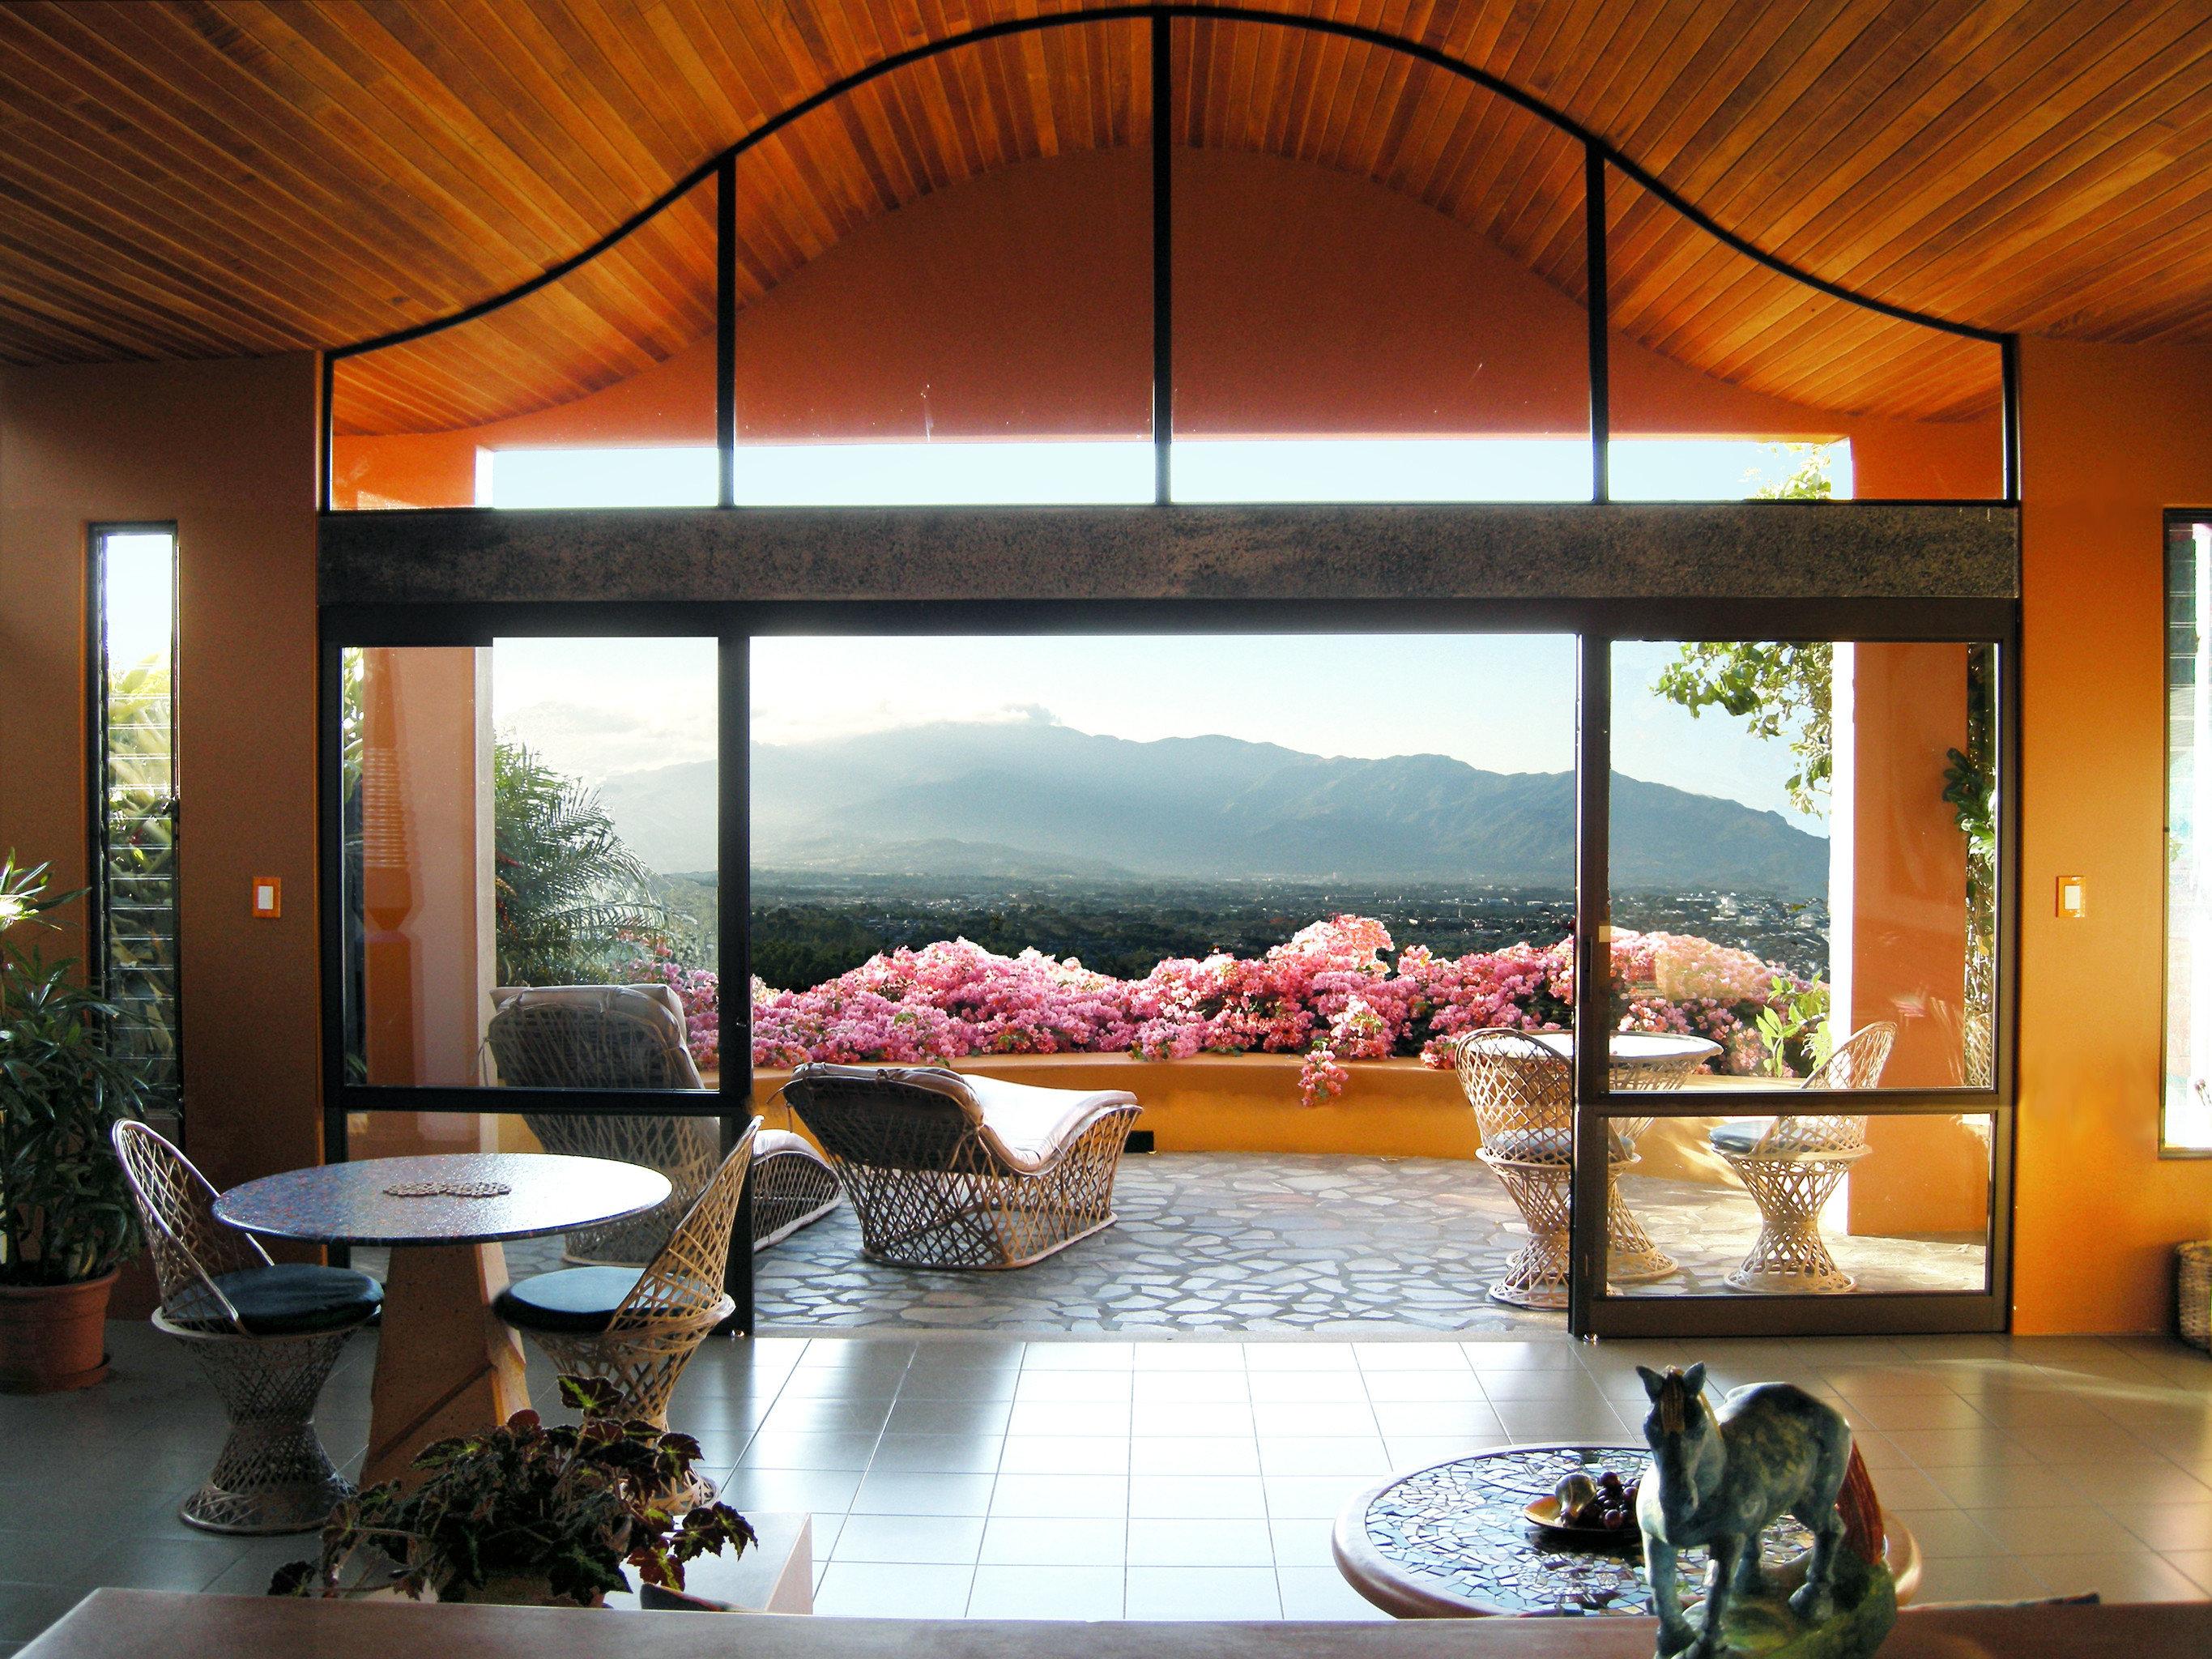 Bedroom Outdoors Patio Scenic views Suite Wellness property home living room Lobby restaurant Villa condominium